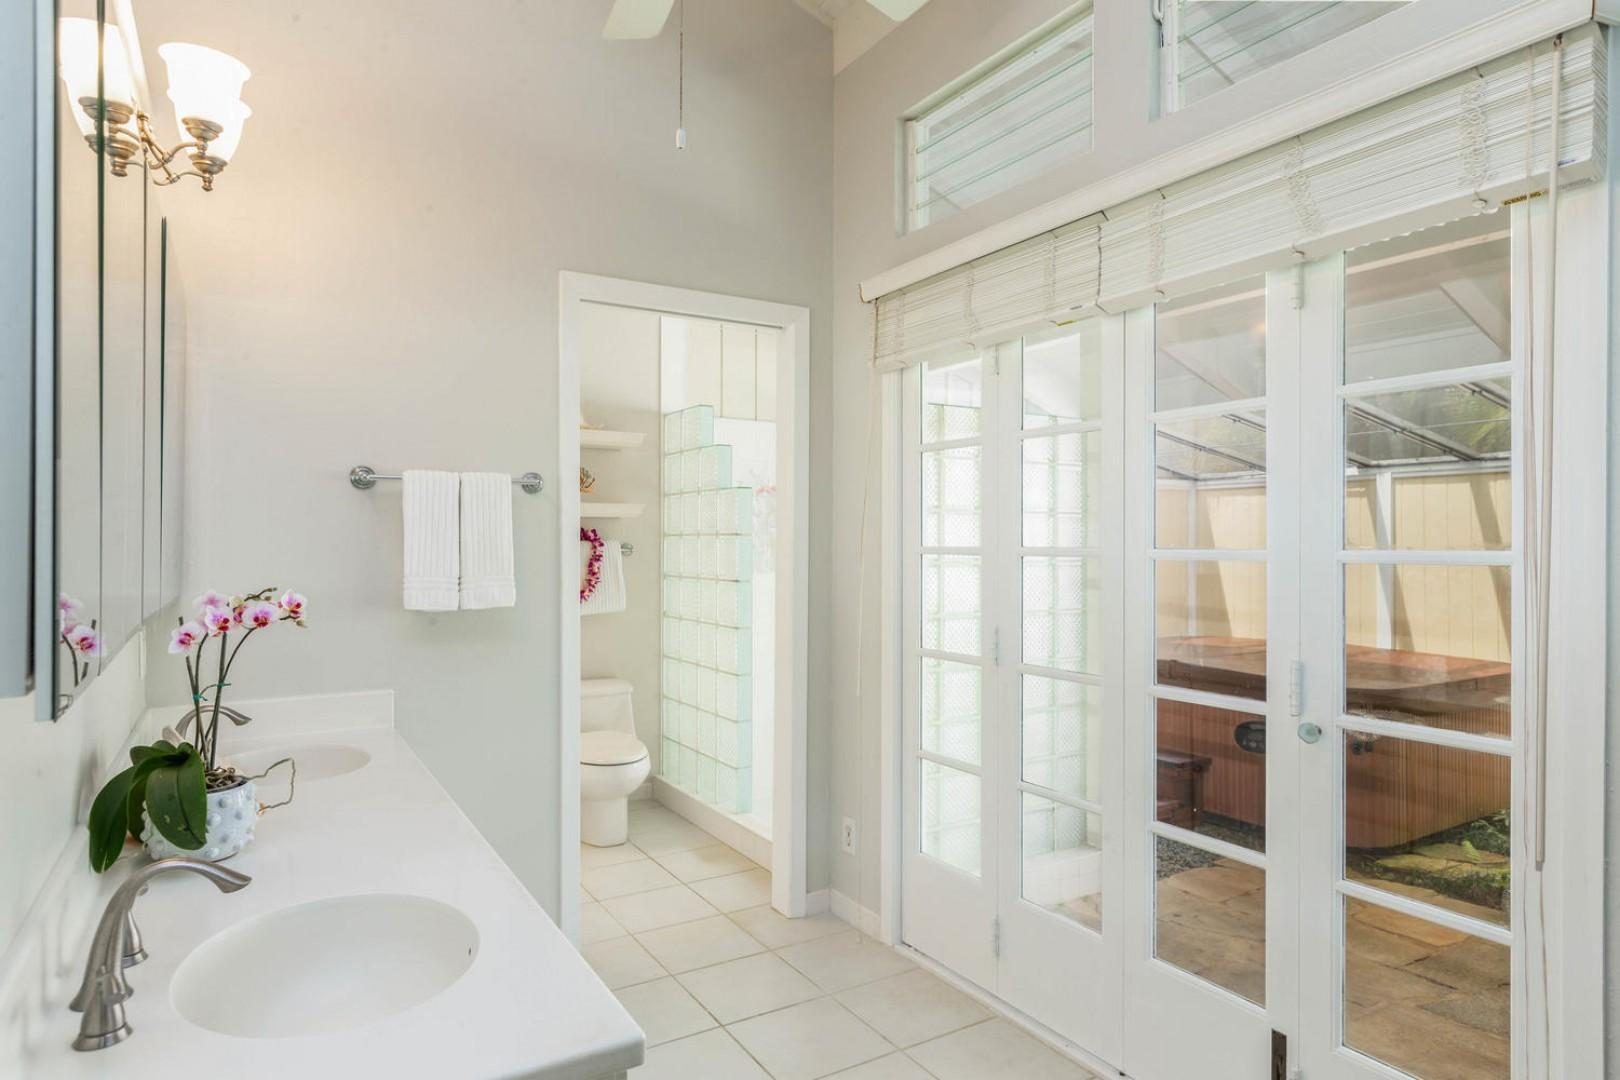 Spacious and elegant en suite master bath